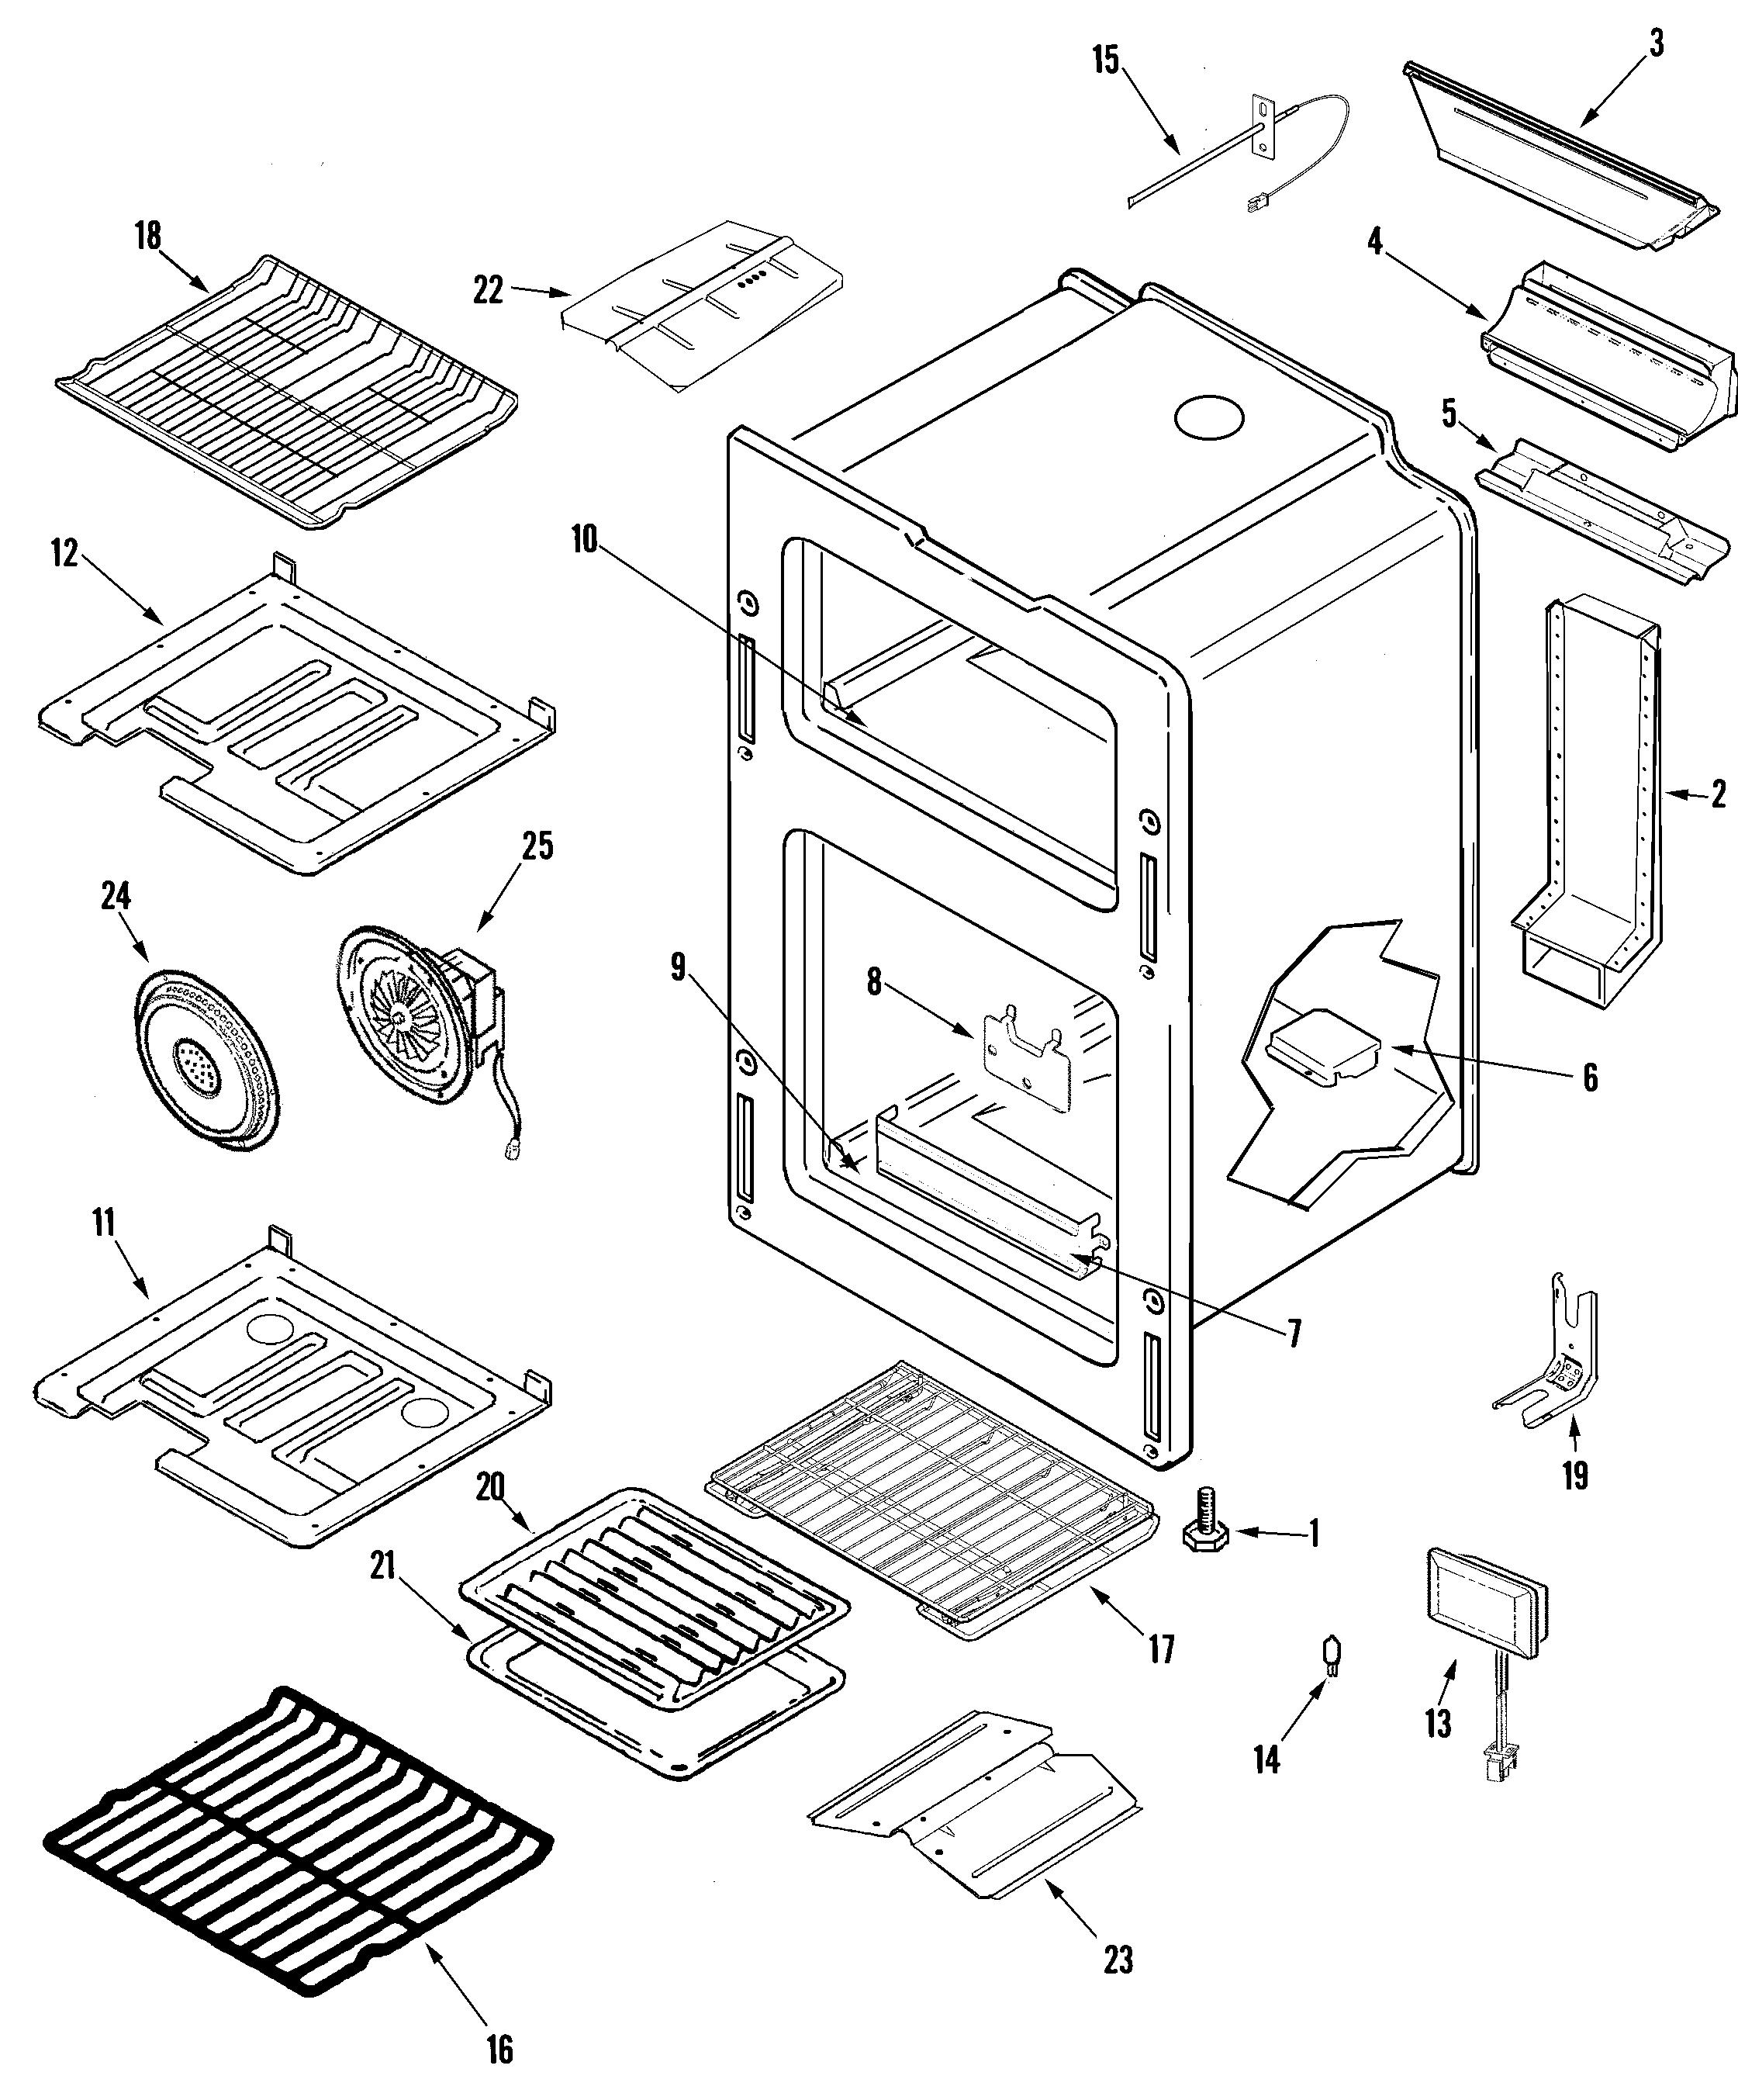 Cool Maytag Performa Wiring Diagram Wiring Library Wiring Cloud Faunaidewilluminateatxorg